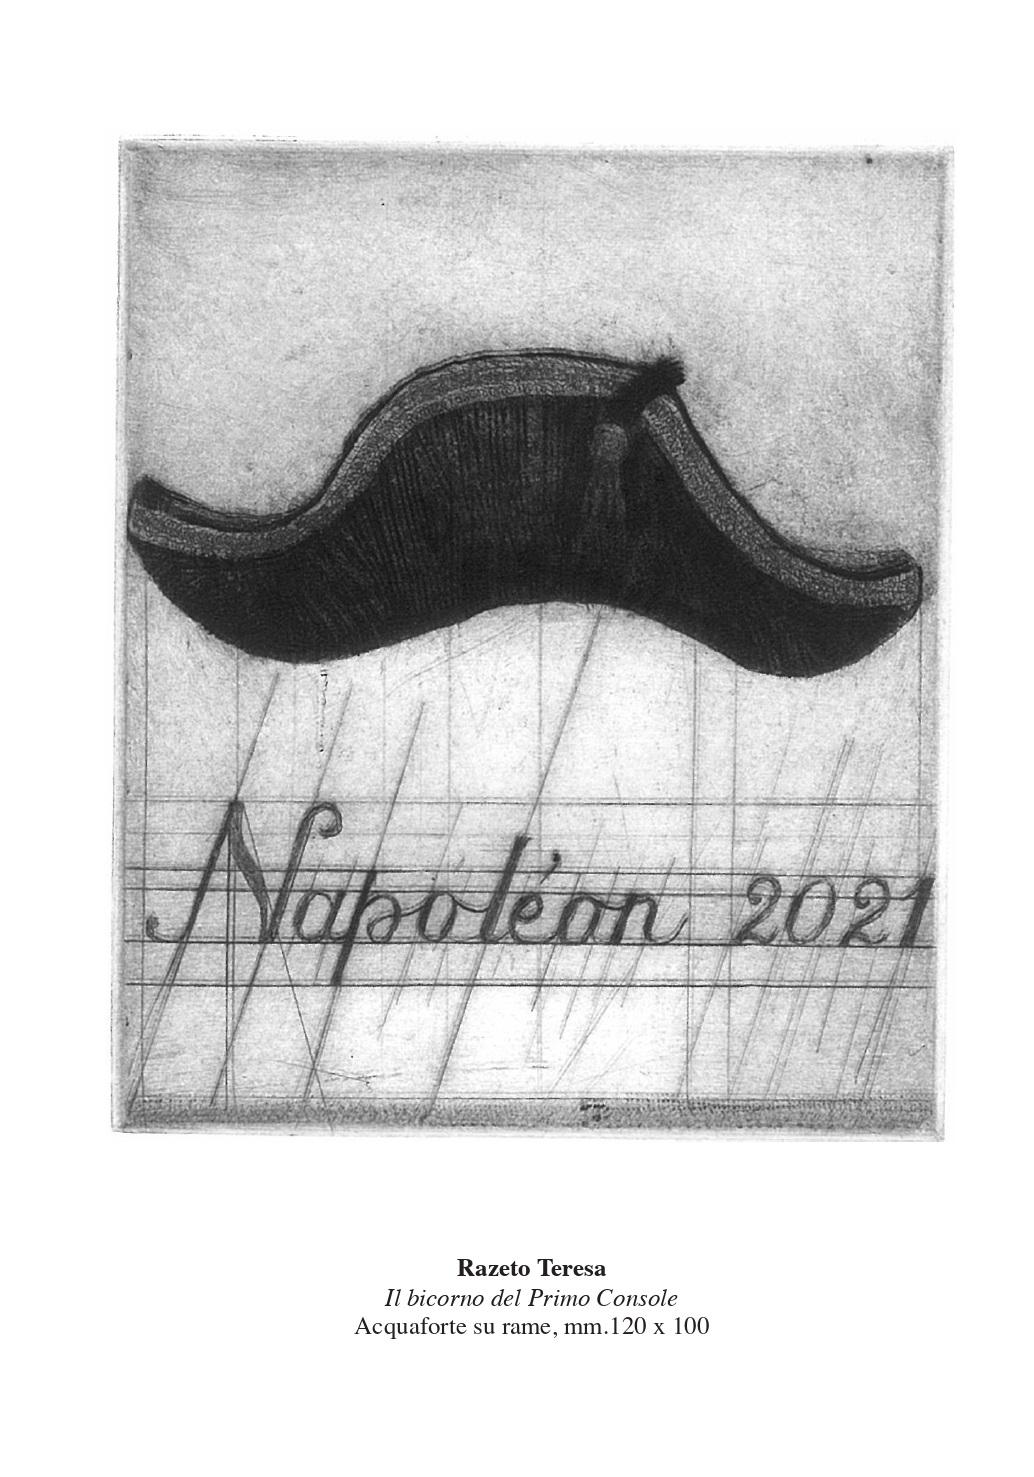 CATALOGO exlibris 2021-128_page-0001